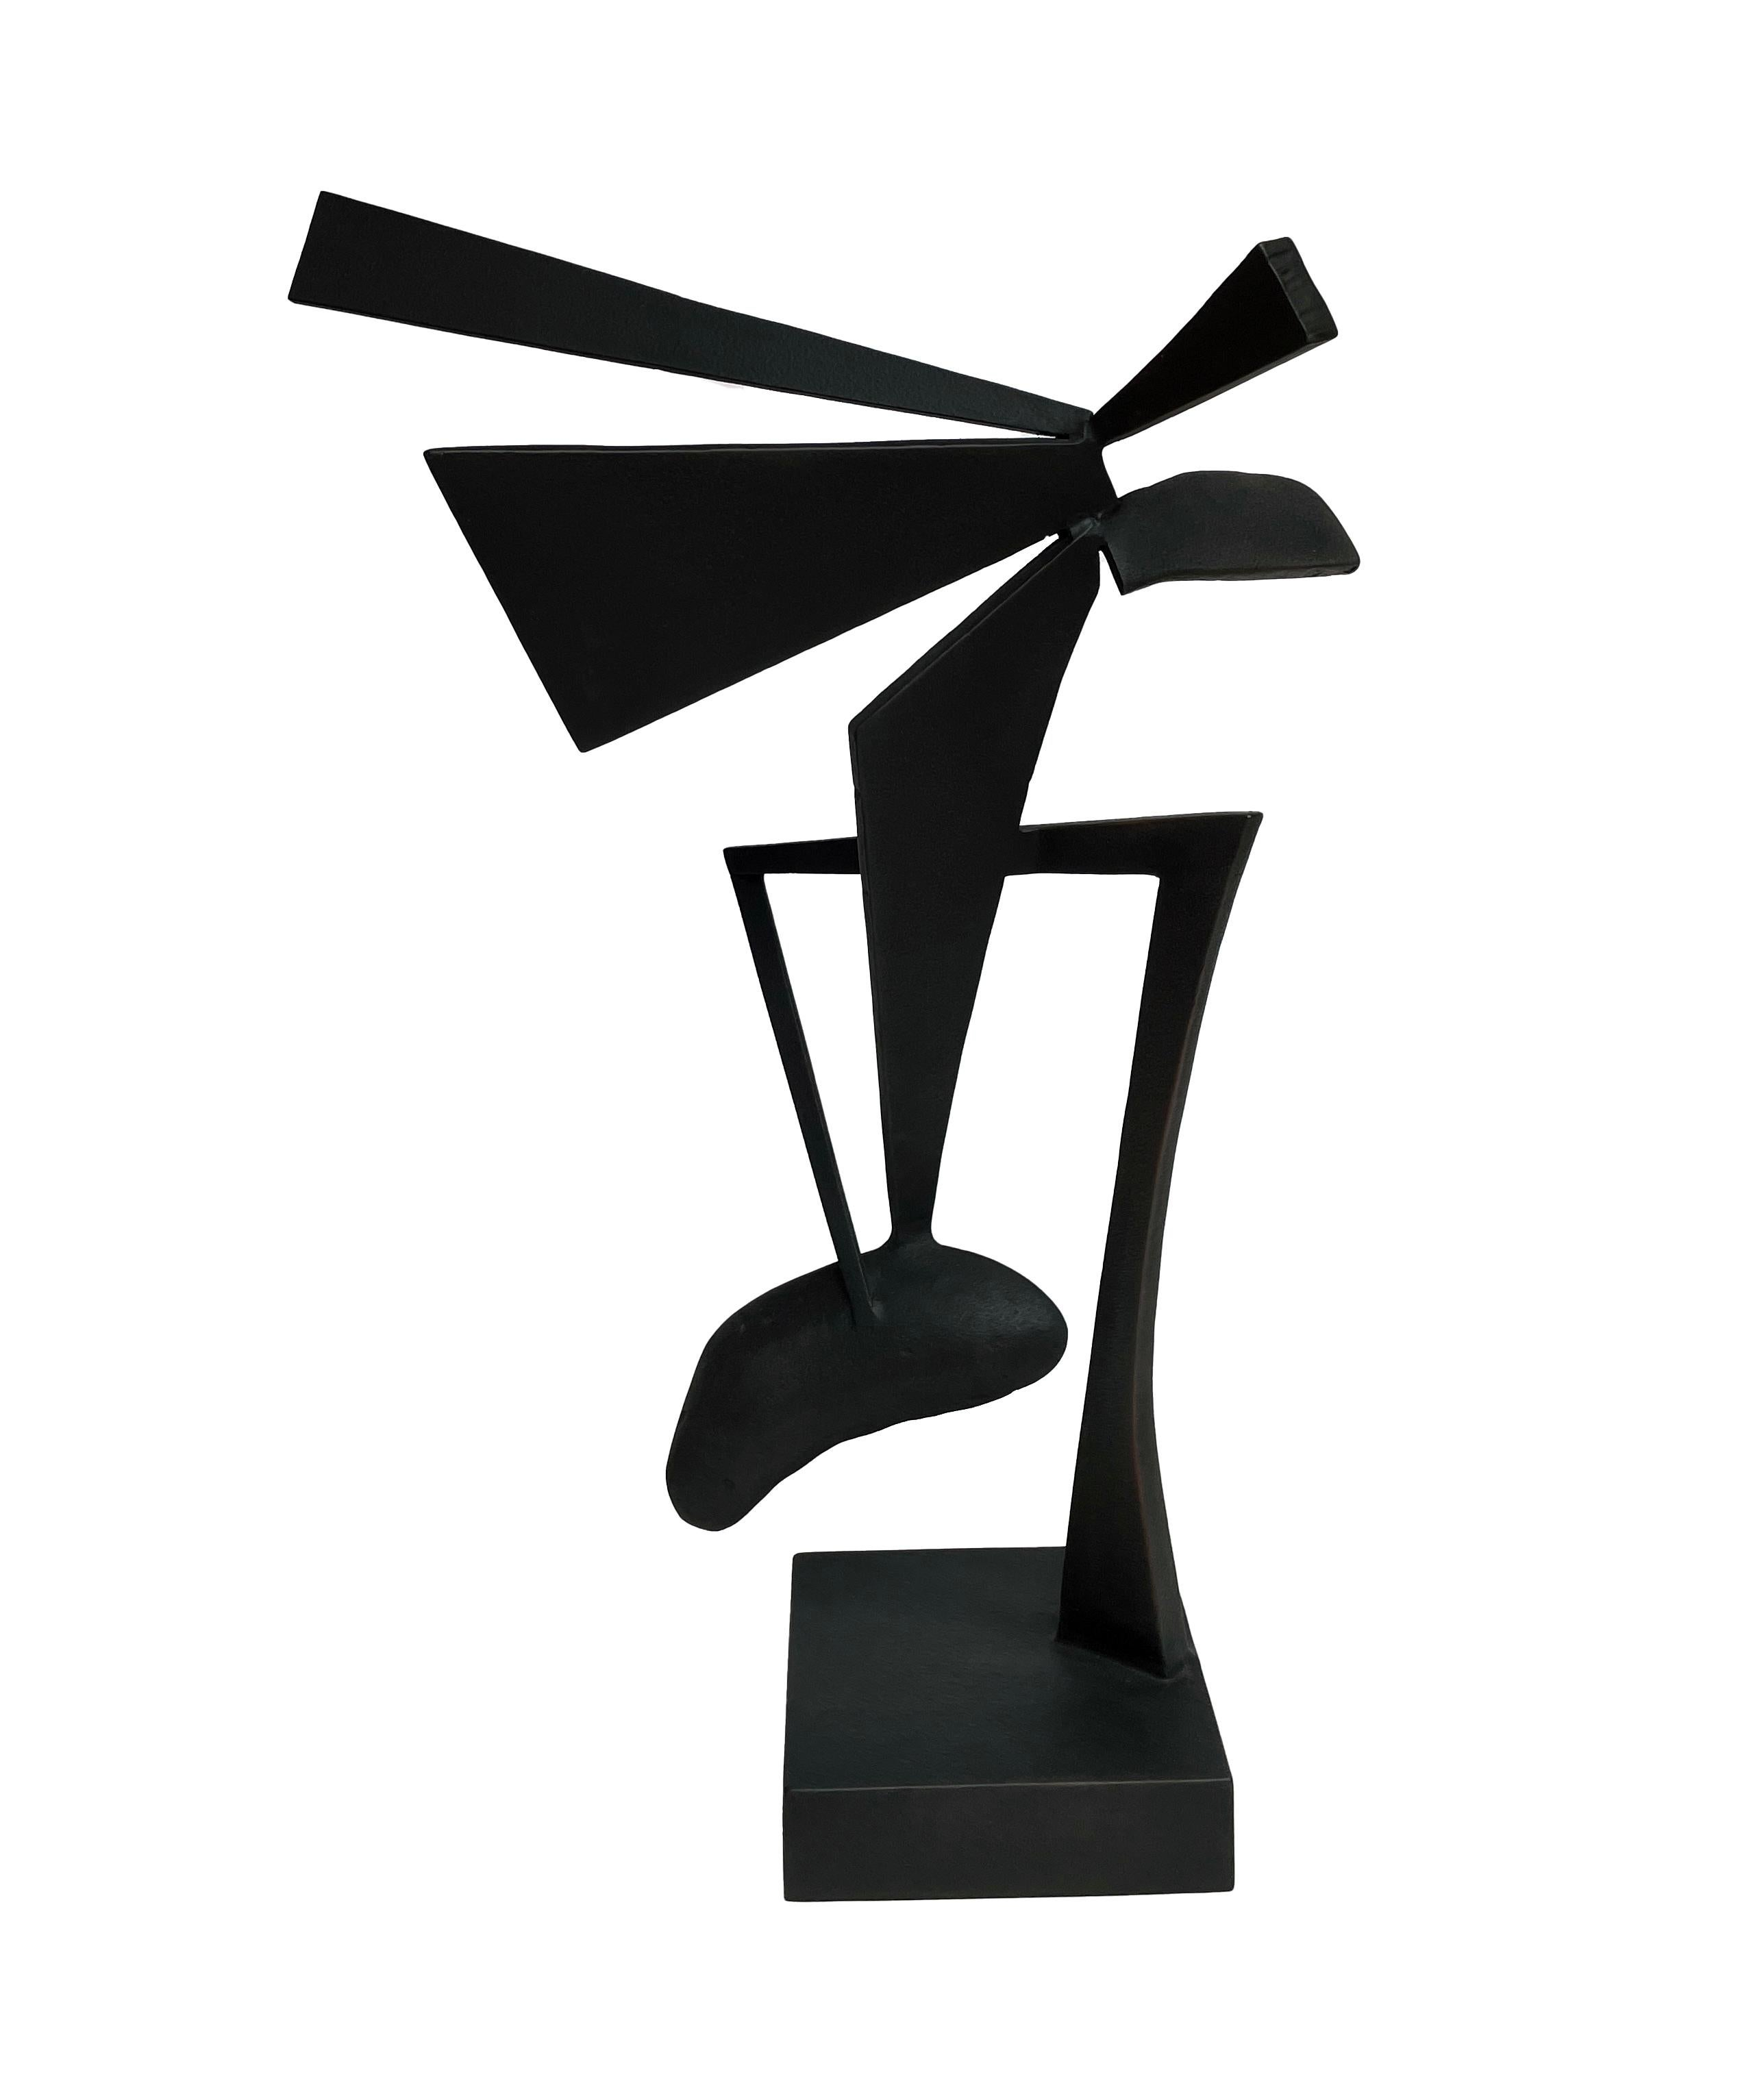 Looking Back - Black Abstract Geometric Form, Welded Steel Sculpture